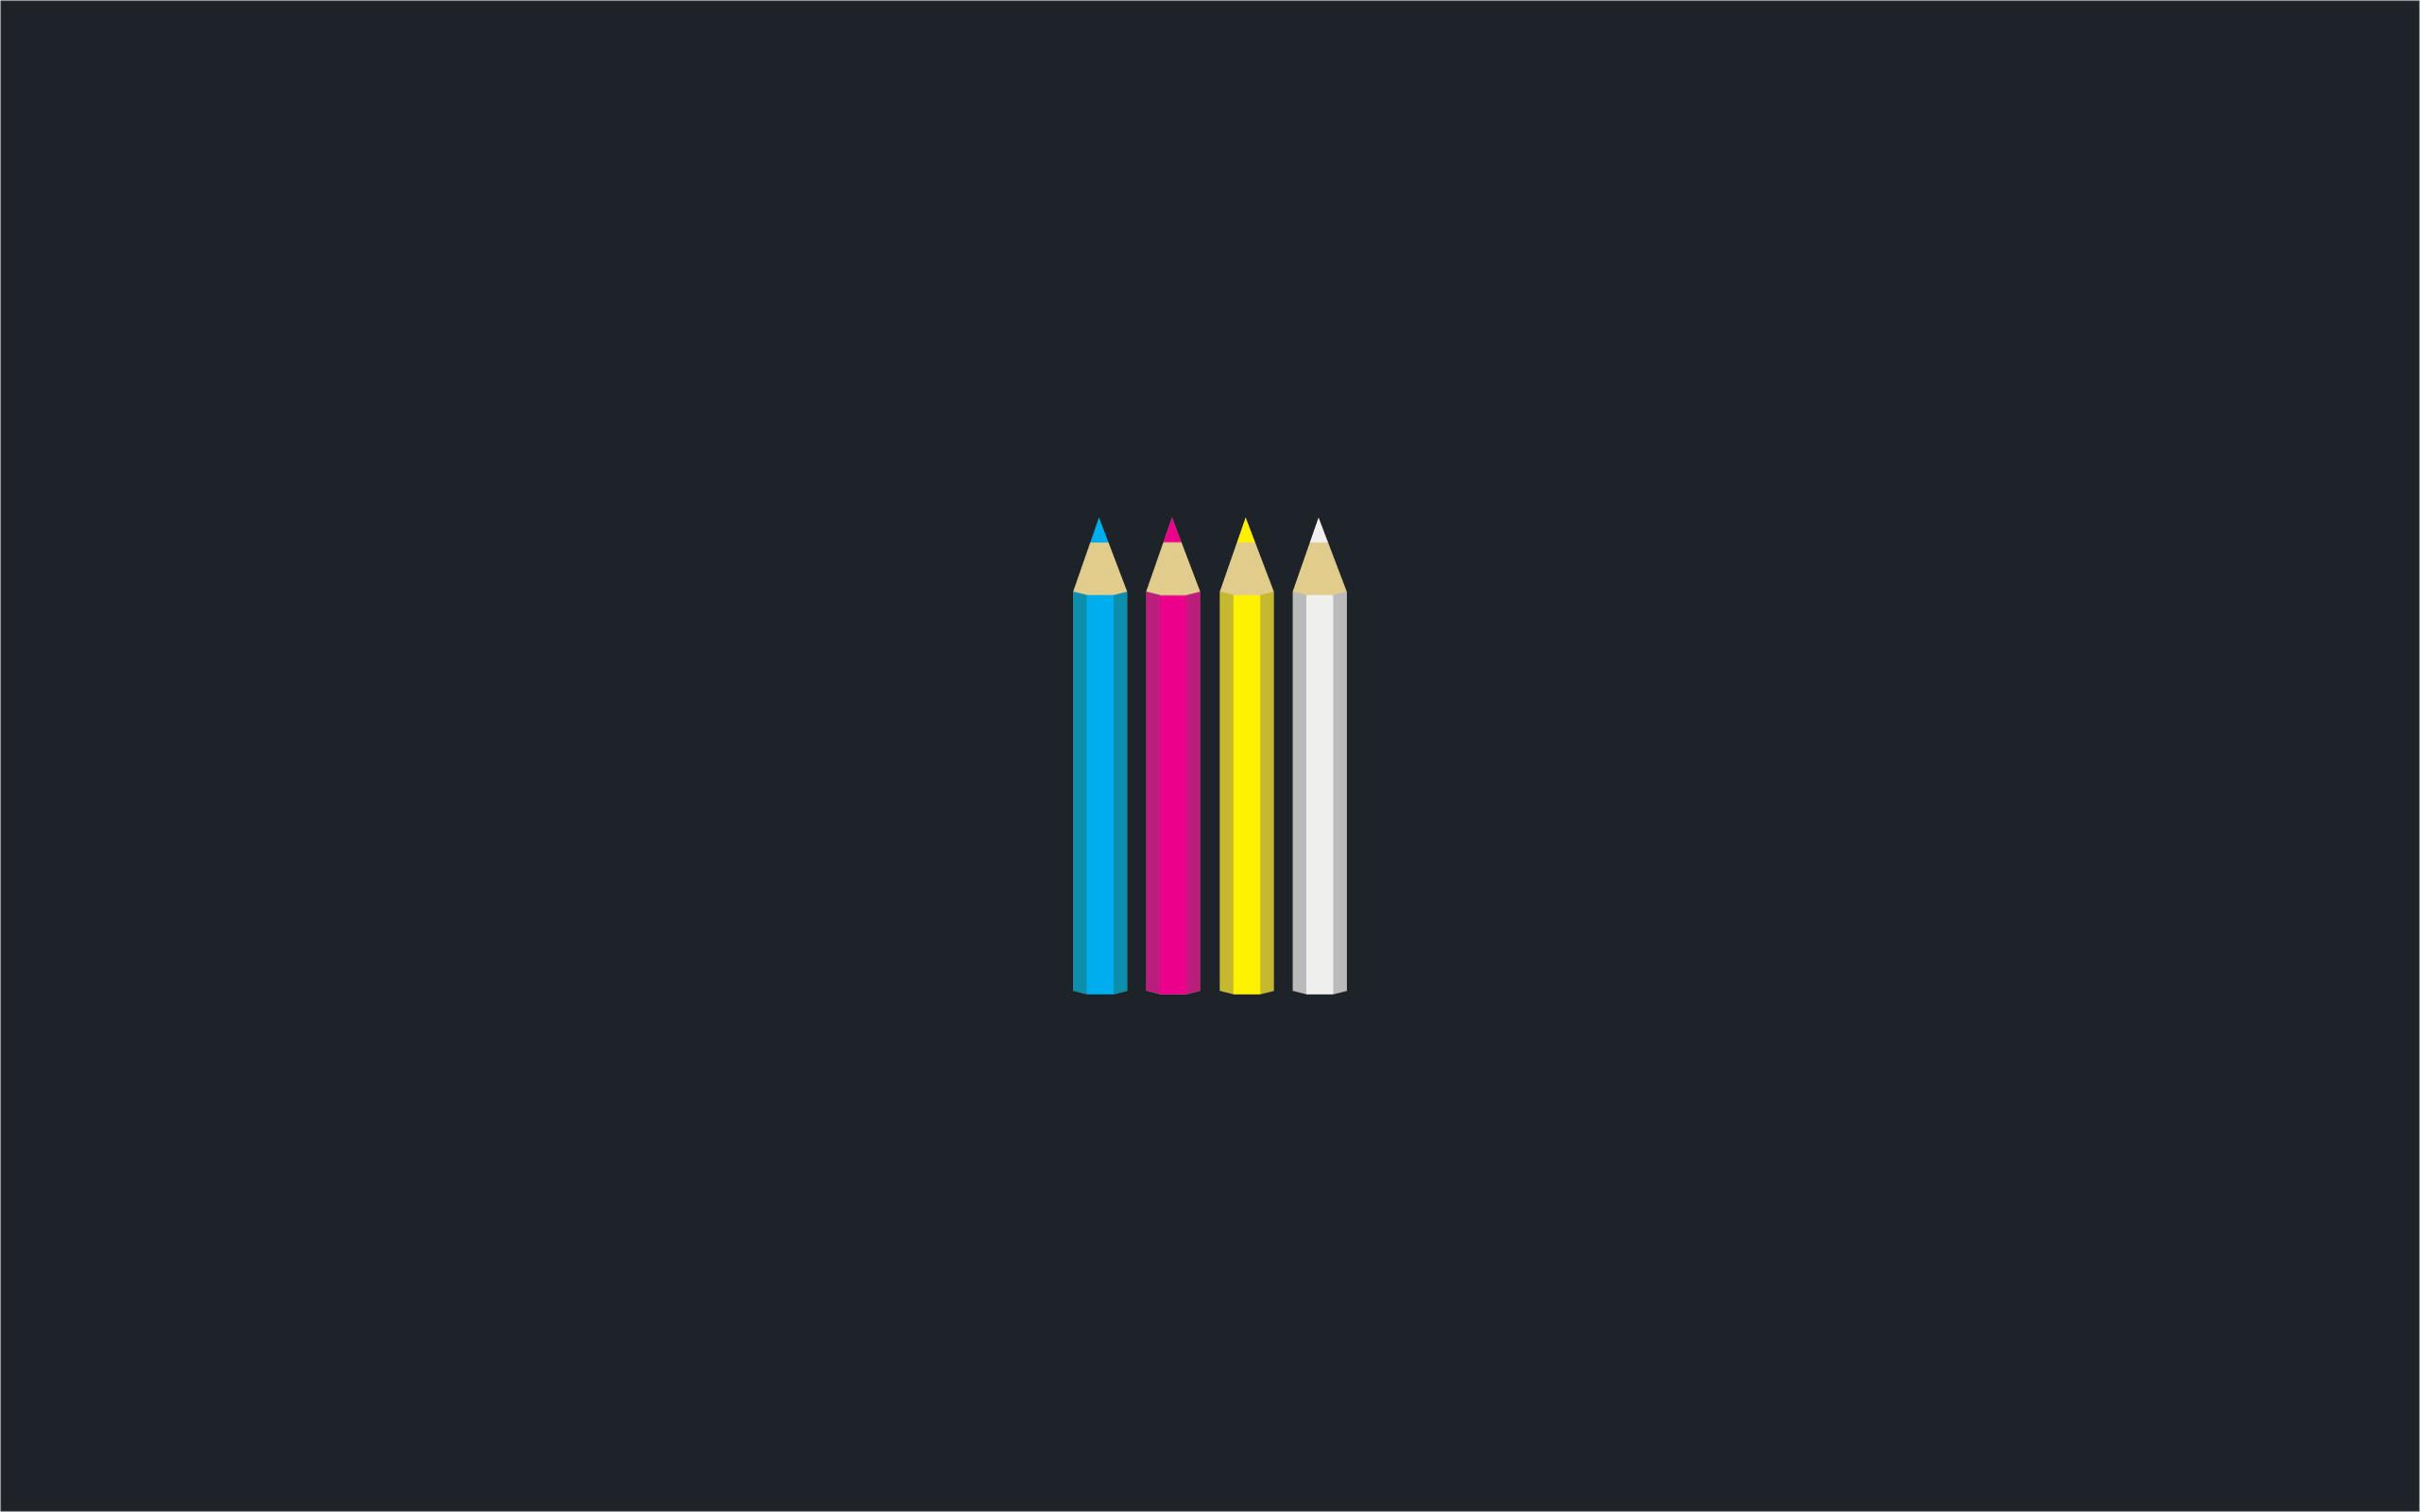 150 Simple Desktop Wallpapers for Minimalist Lovers   Internet .